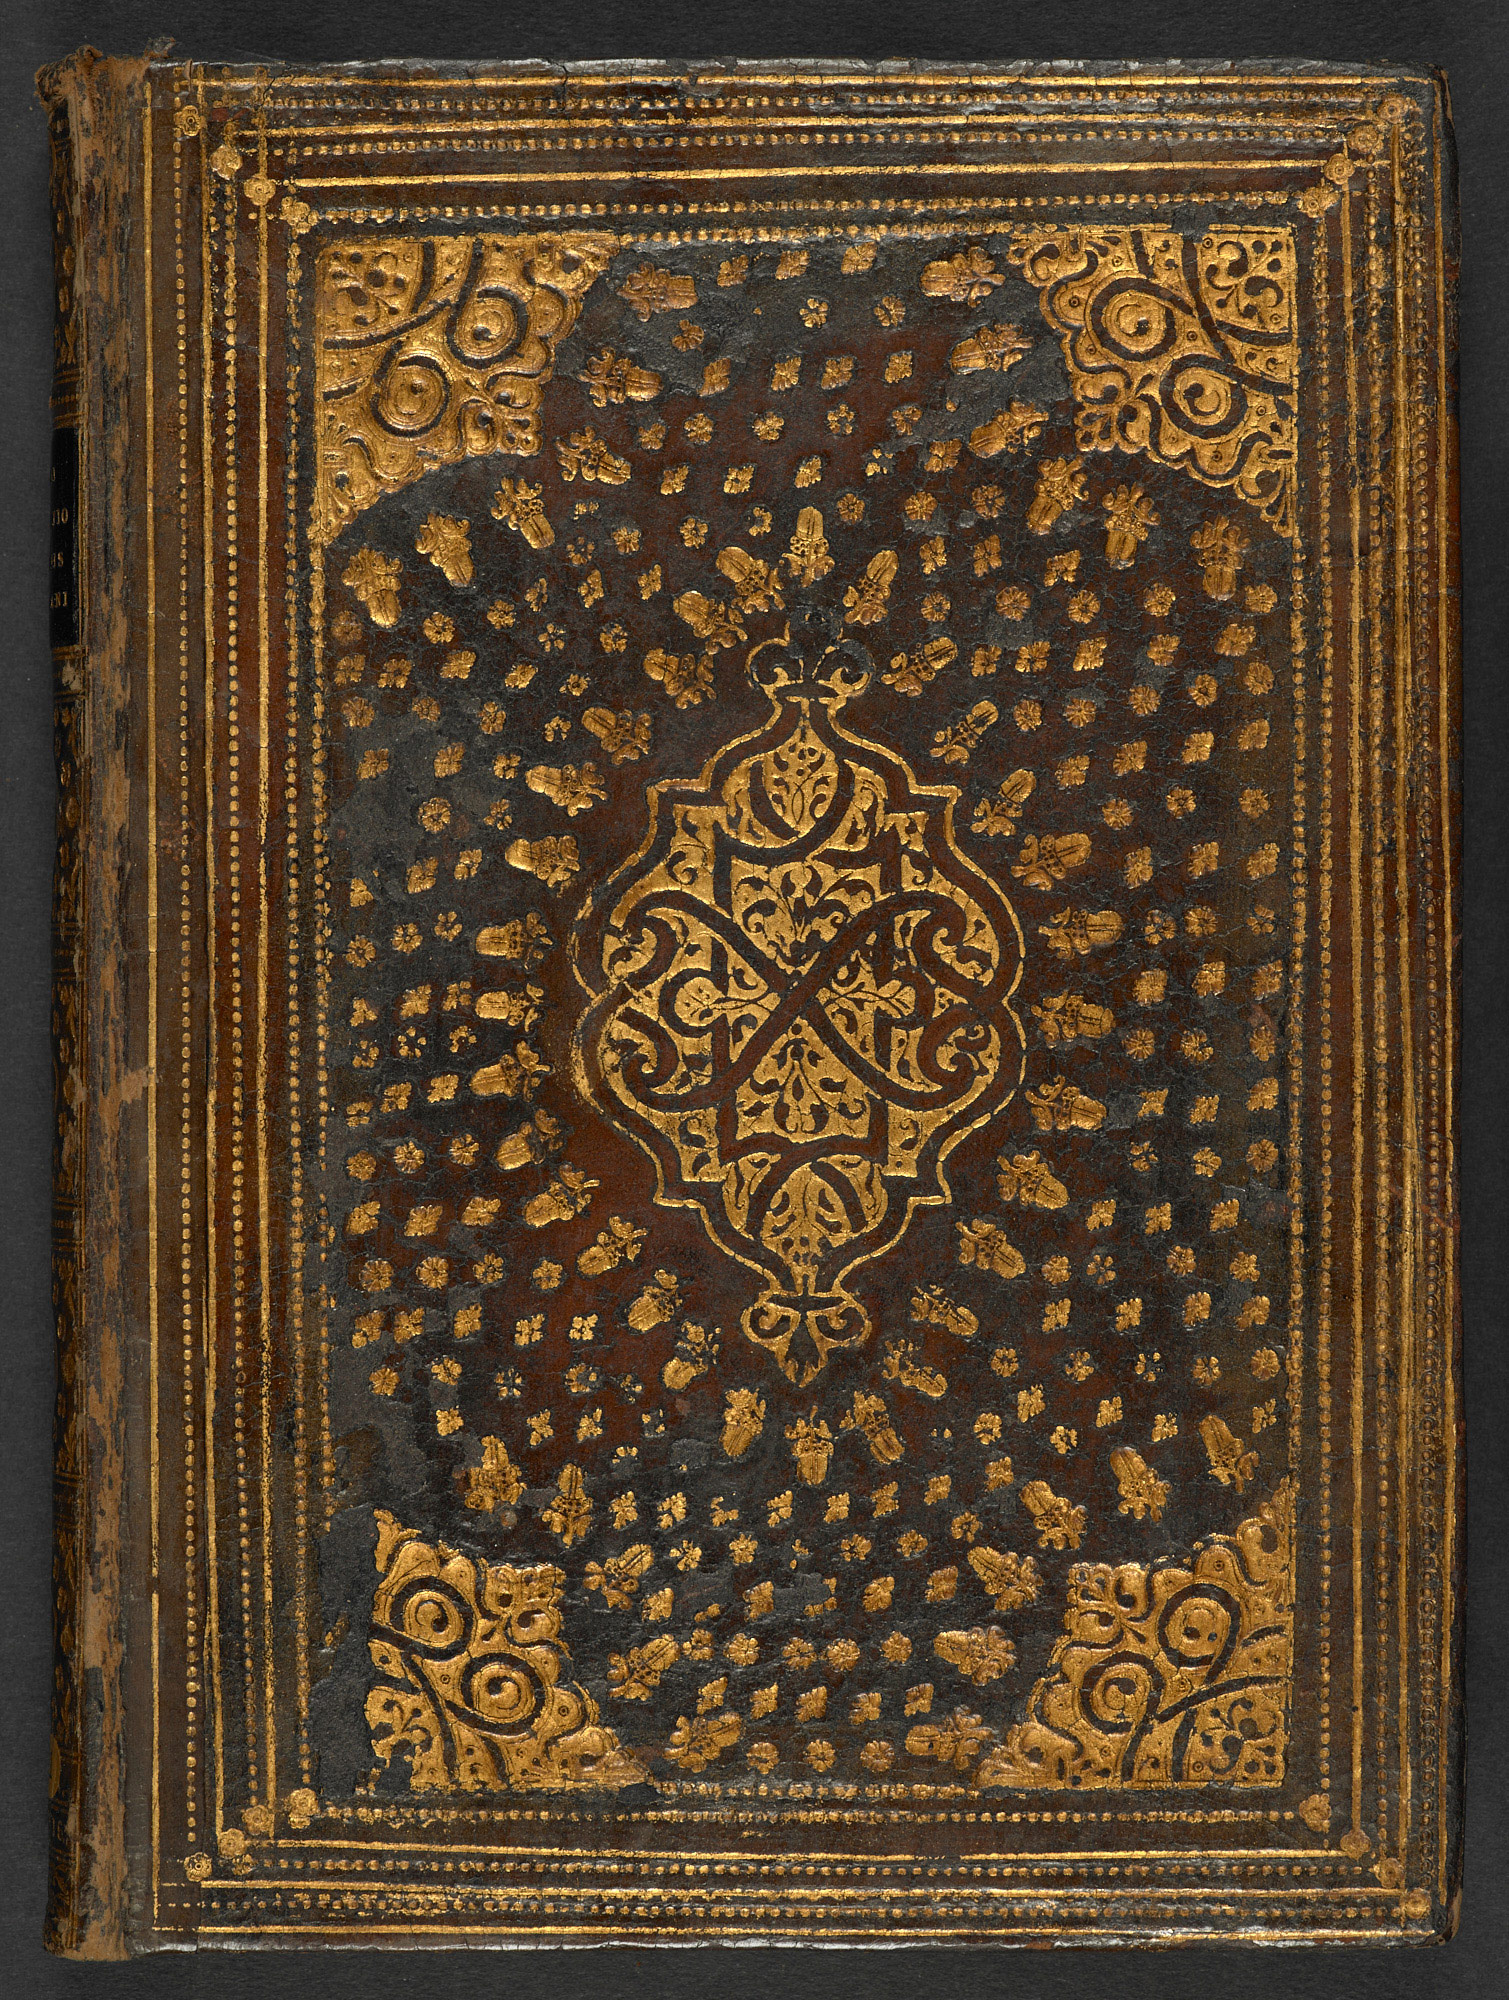 Desiderius Erasmus' Institutio Principis Christiani, or The Education of A Christian Prince 1516